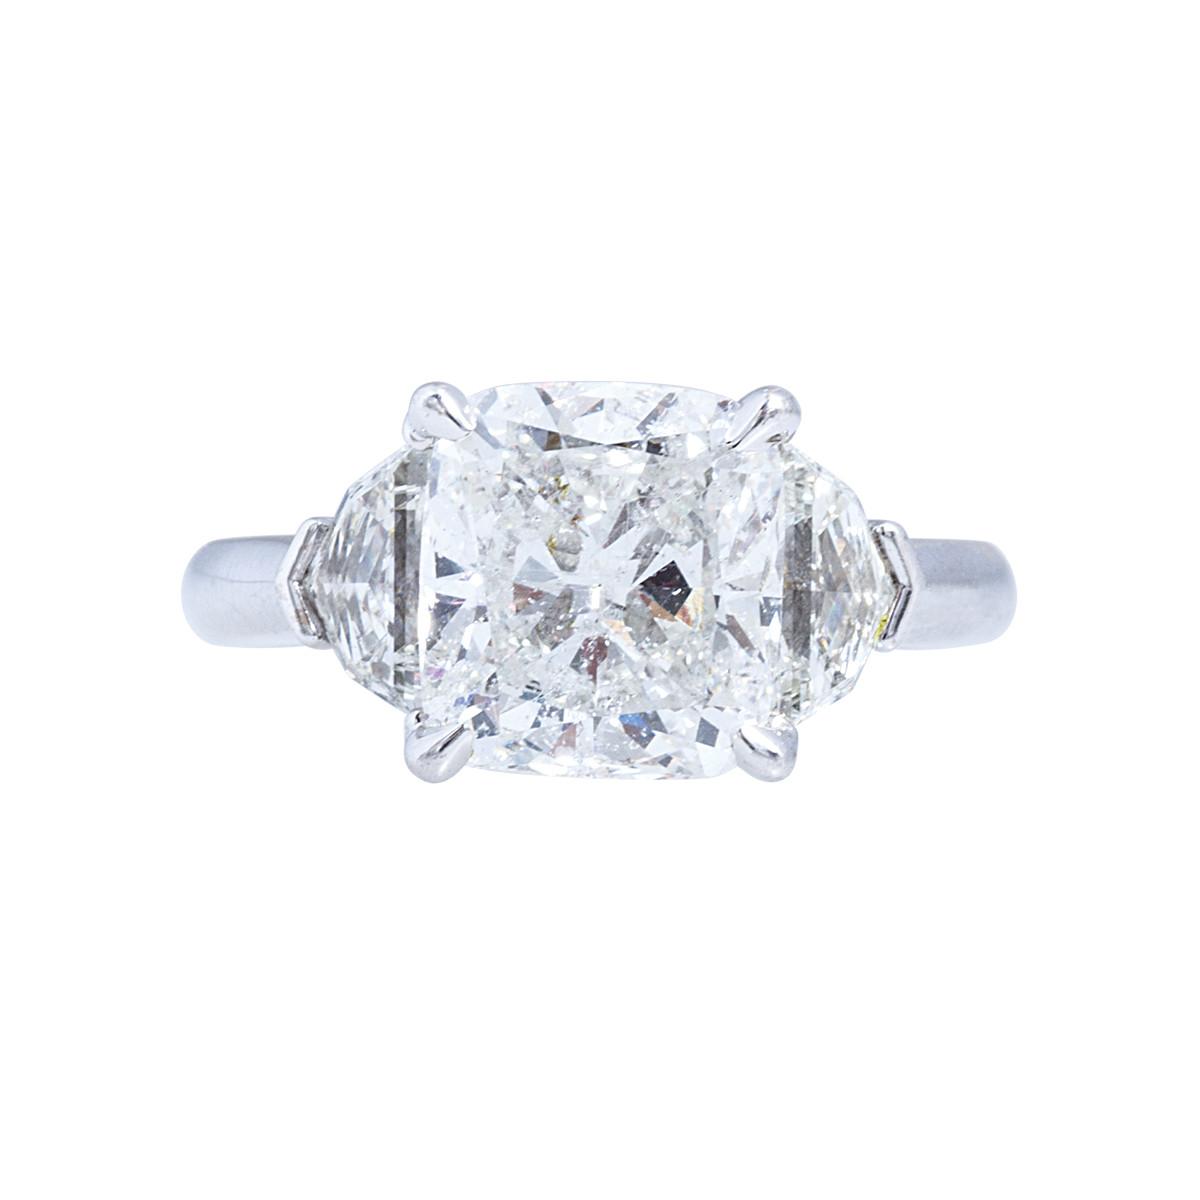 New 3.95 CTW Diamond Ring